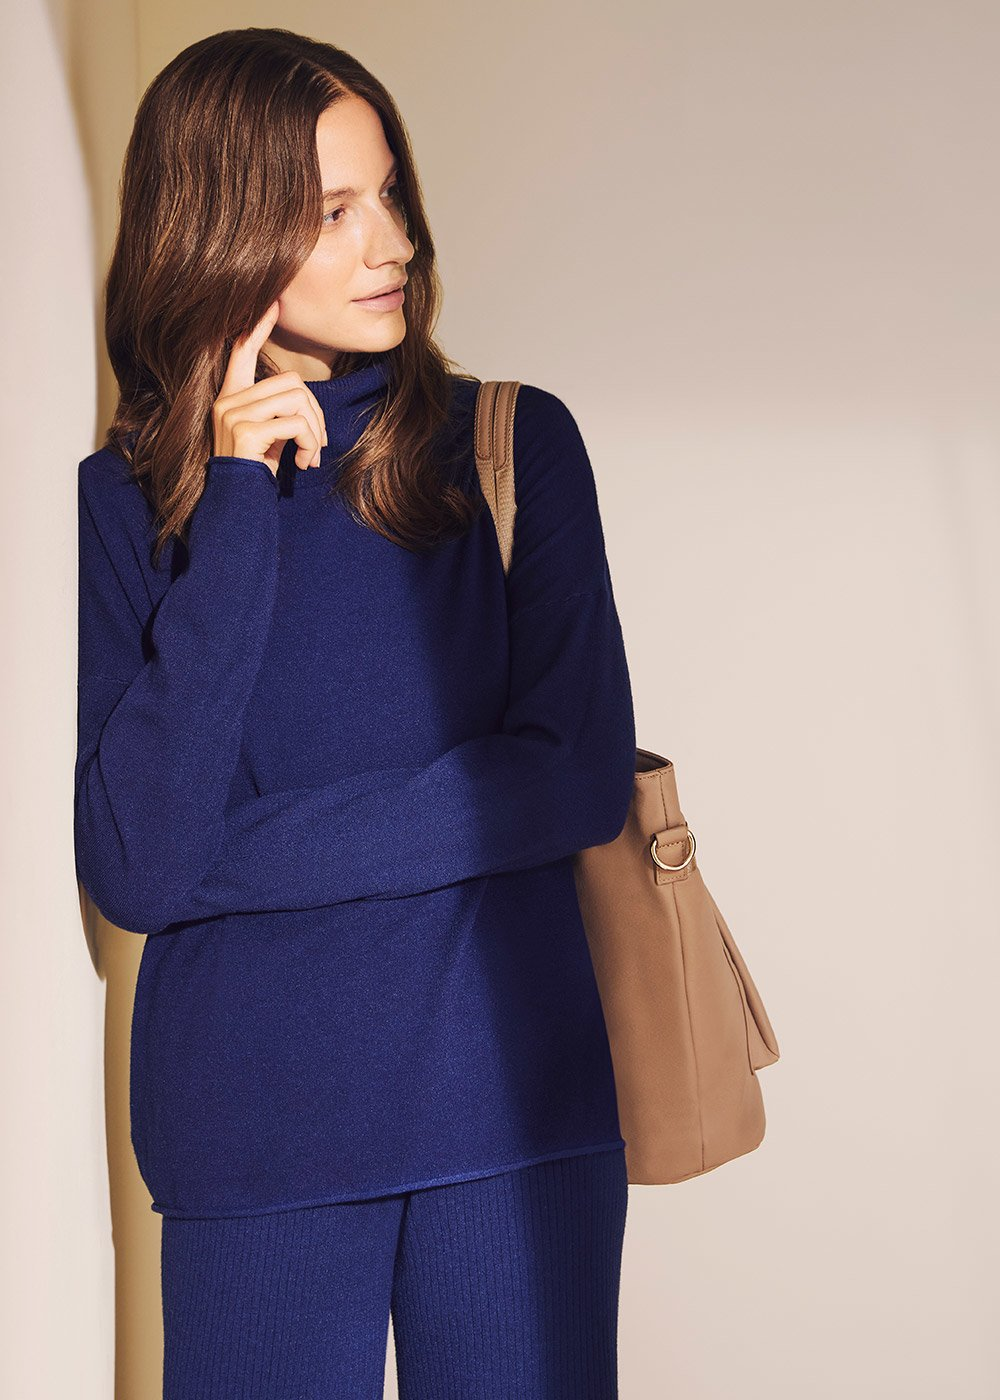 Medea chain stitch sweater - Ultramarine - Woman